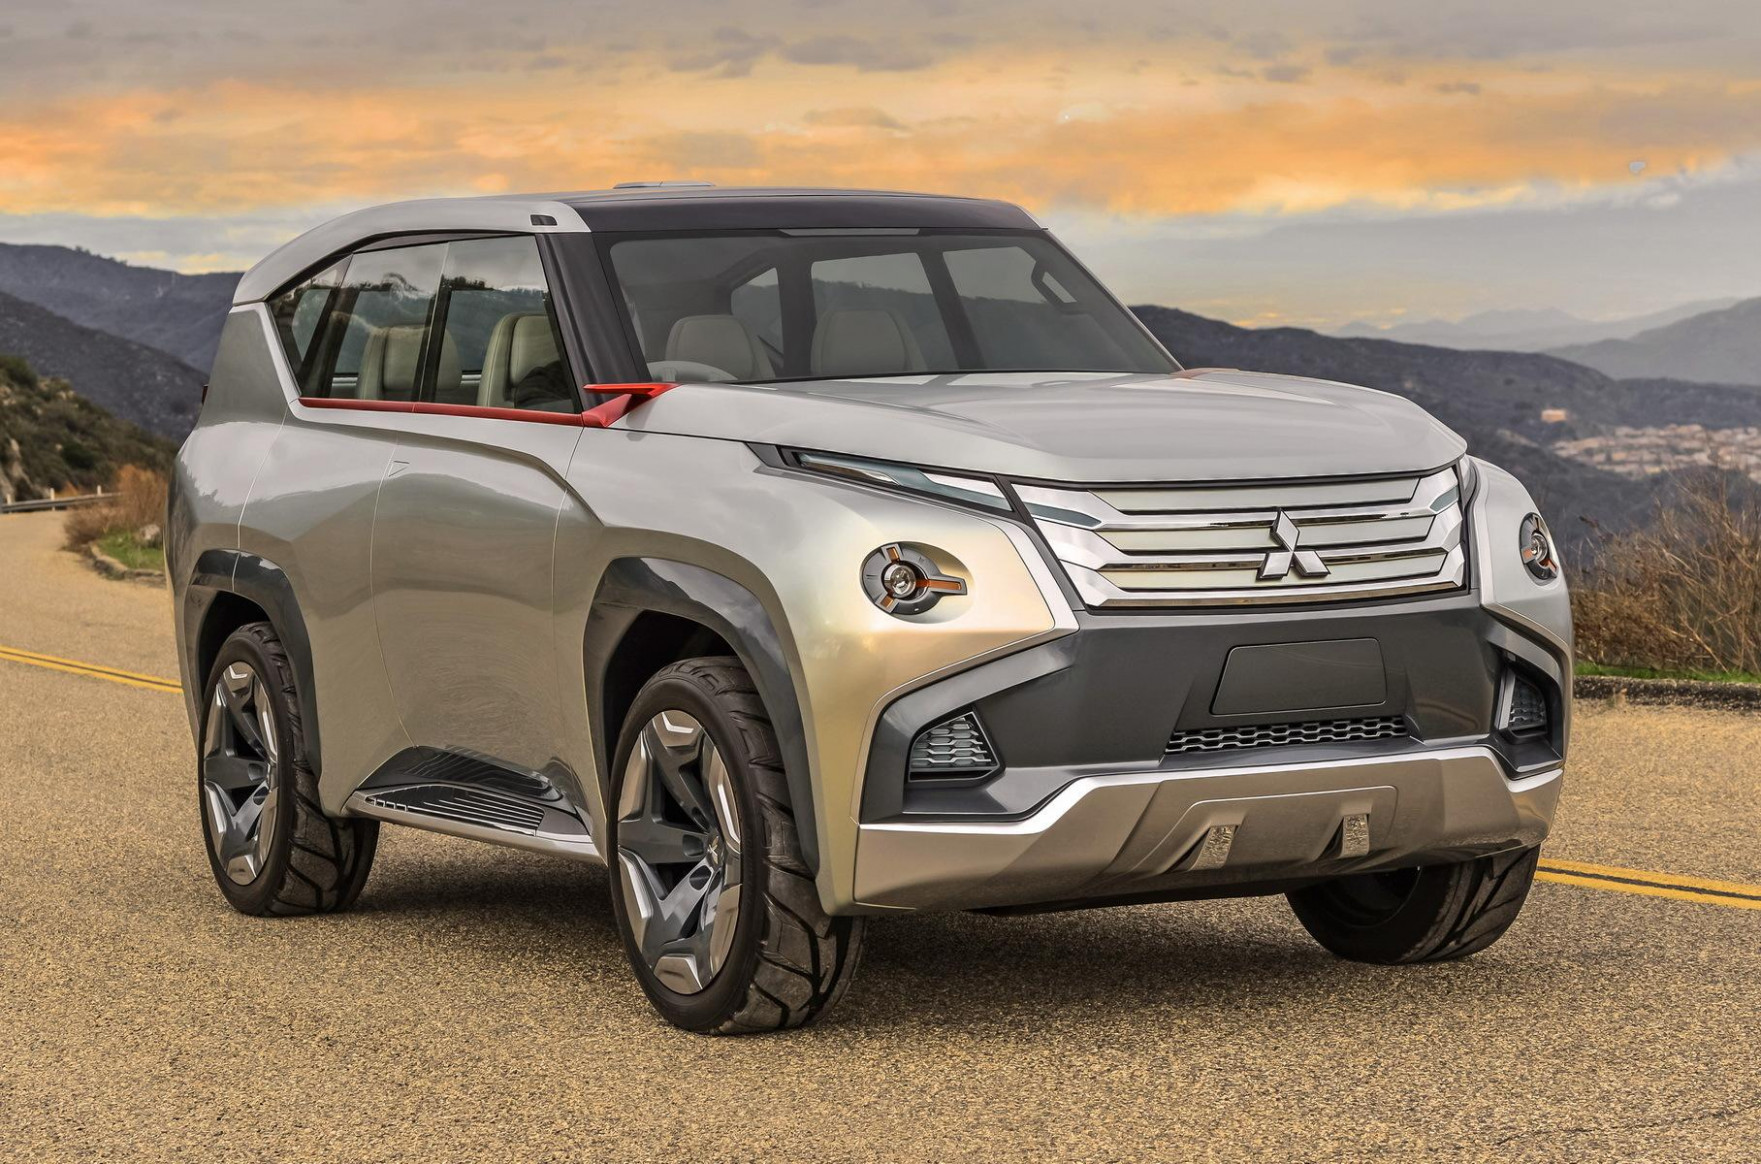 New Review Mitsubishi Pajero 2022